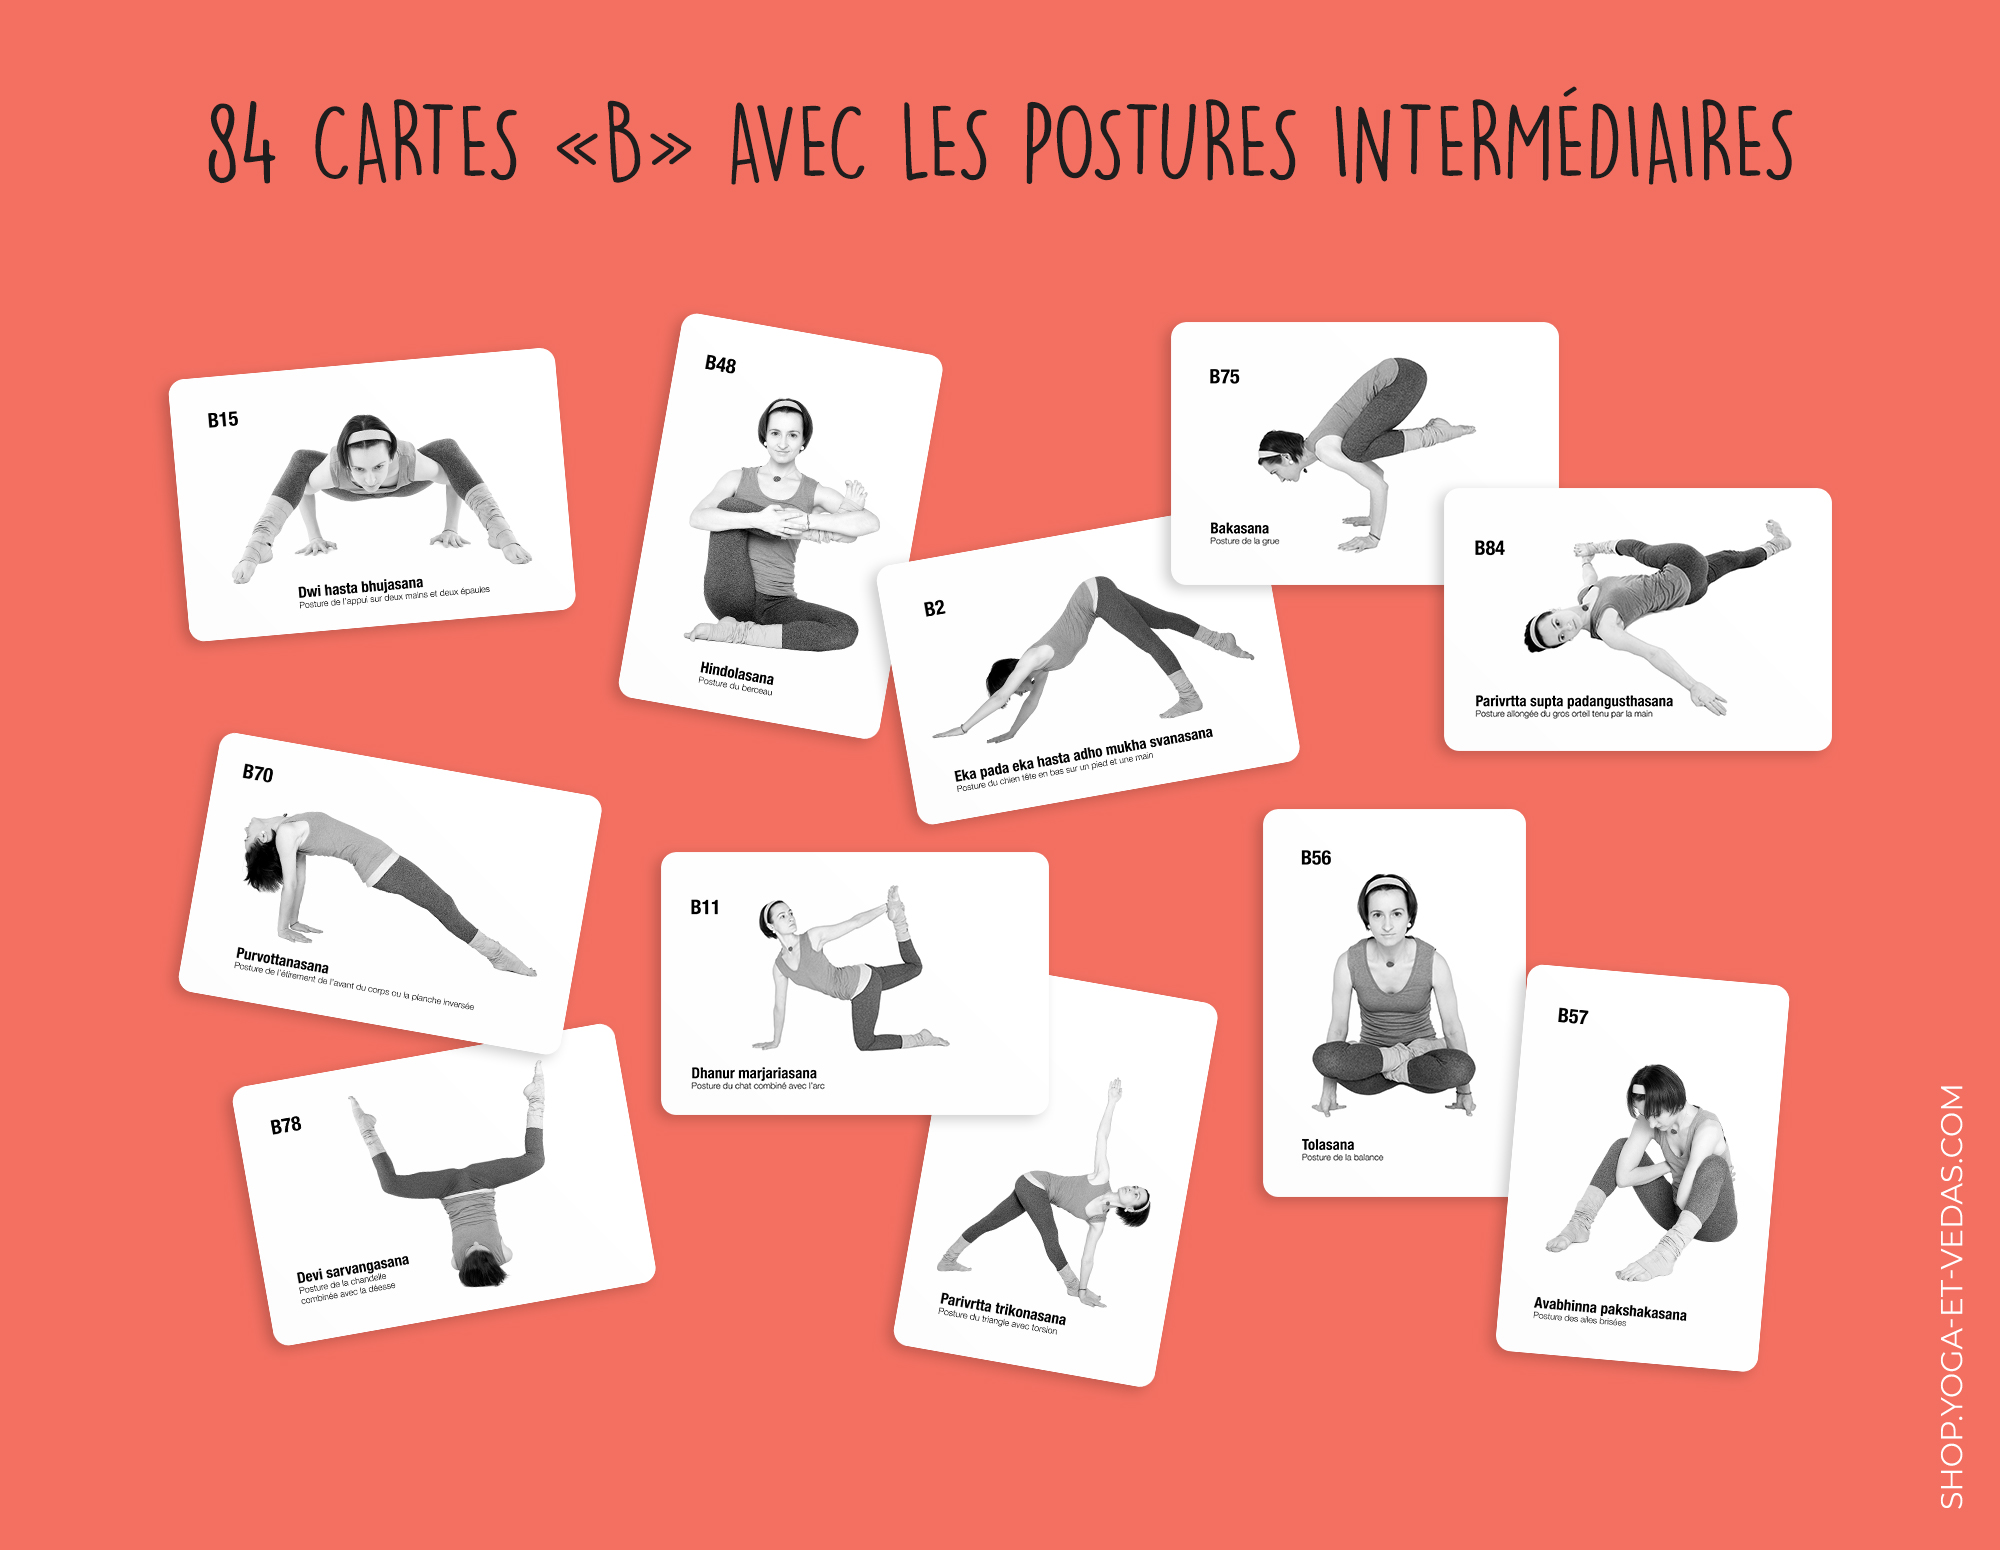 336 cartes de yoga - Cartes B - Shop Yoga&Vedas